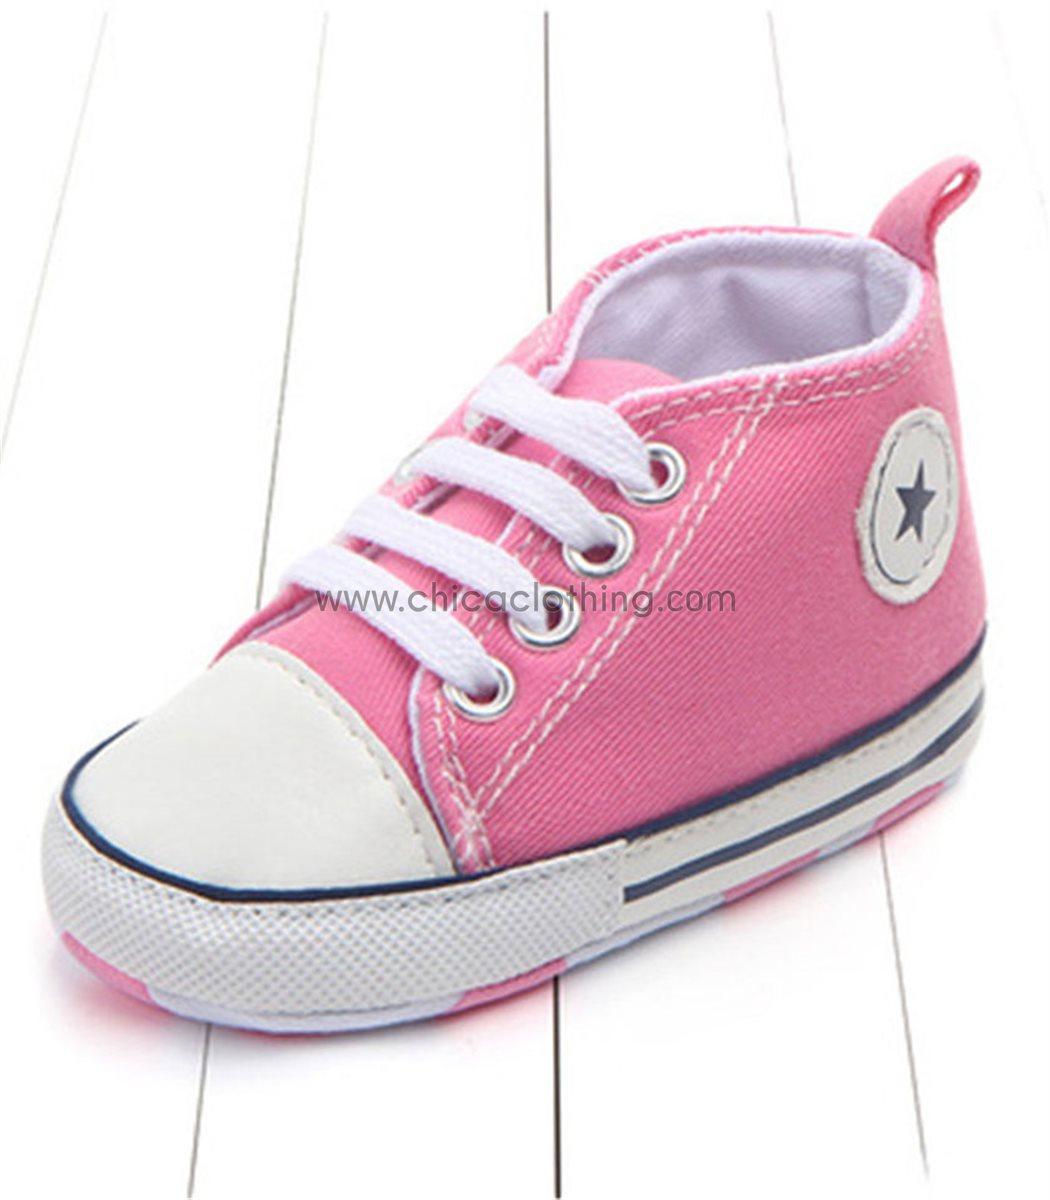 6275cf163e6 Ροζ βρεφικά παπούτσια αγκαλιάς